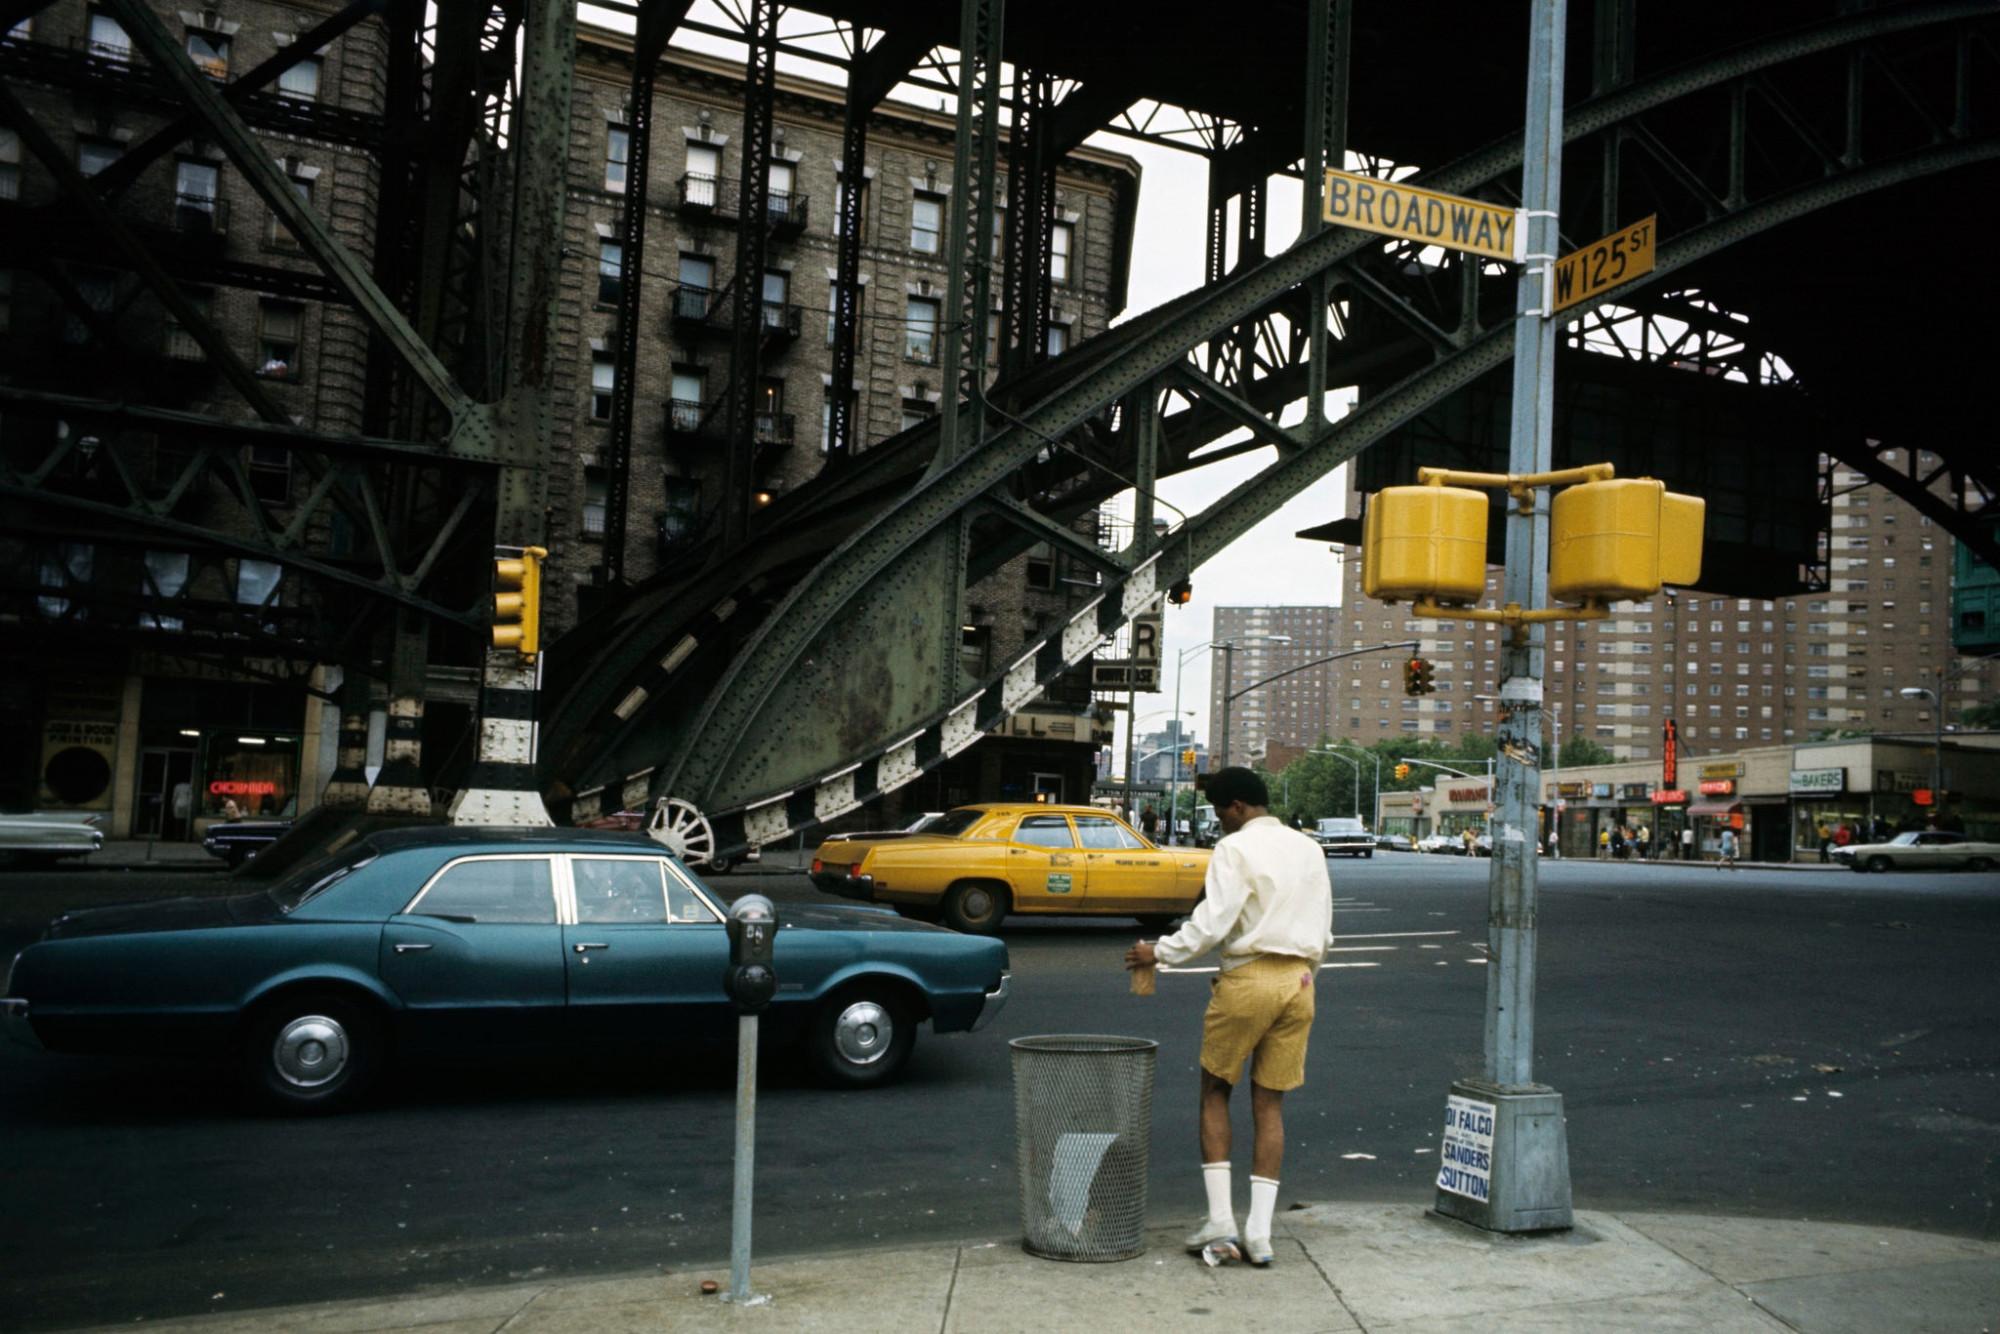 1970 NY Harlem by Jack Garofalo4